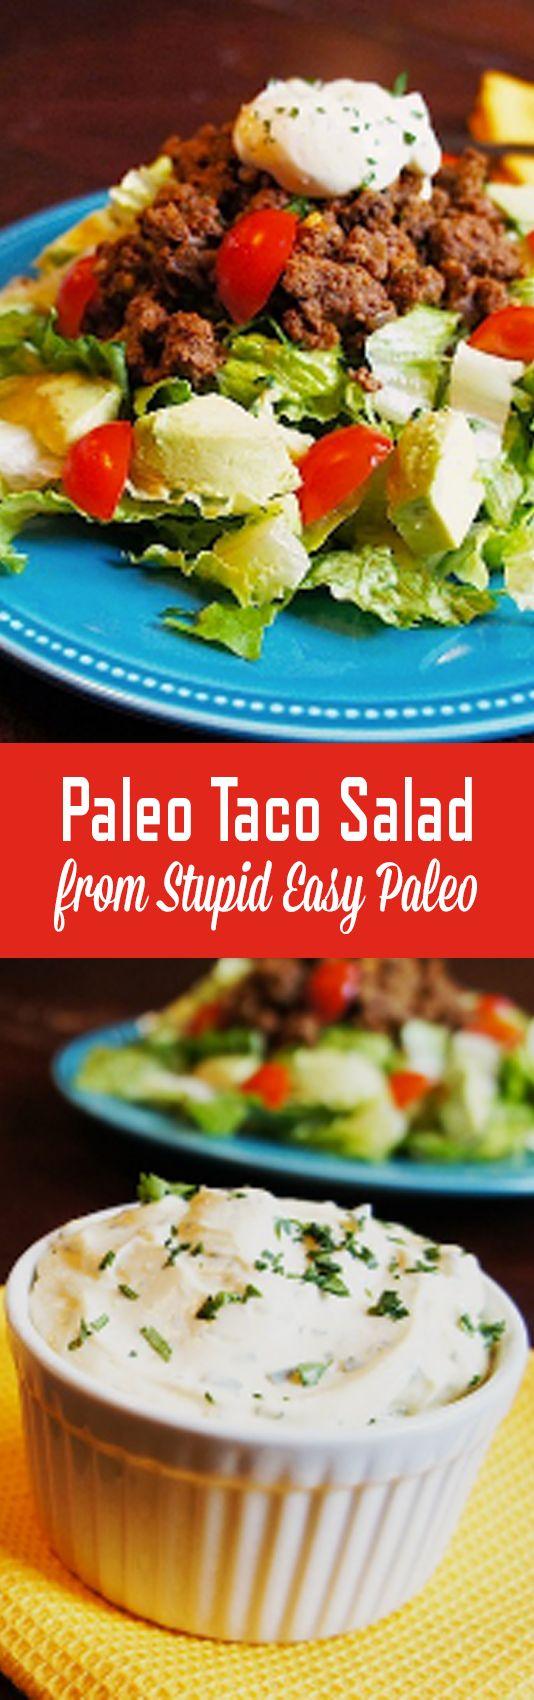 Paleo Taco Salad | StupidEasyPaleo.com                                                                                                                                                                                 More